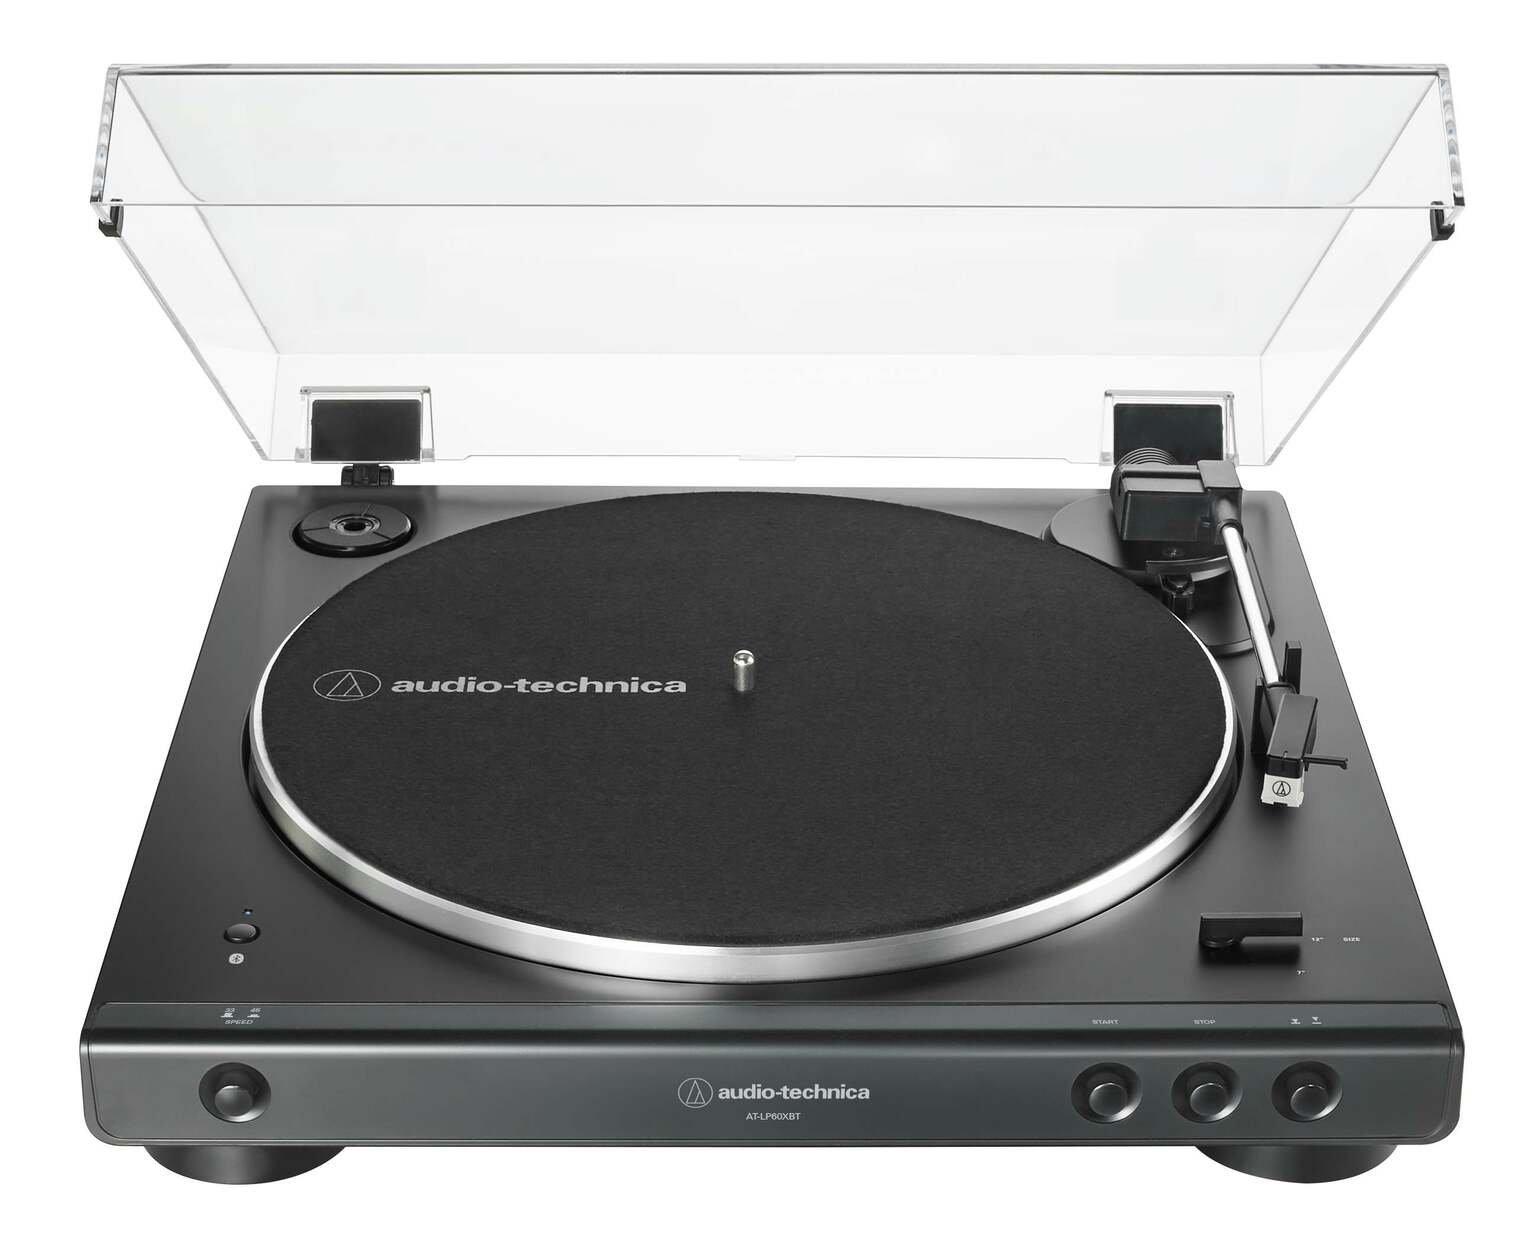 Audio-Technica AT-LP60XBTBK Wireless Belt-Drive Turntable